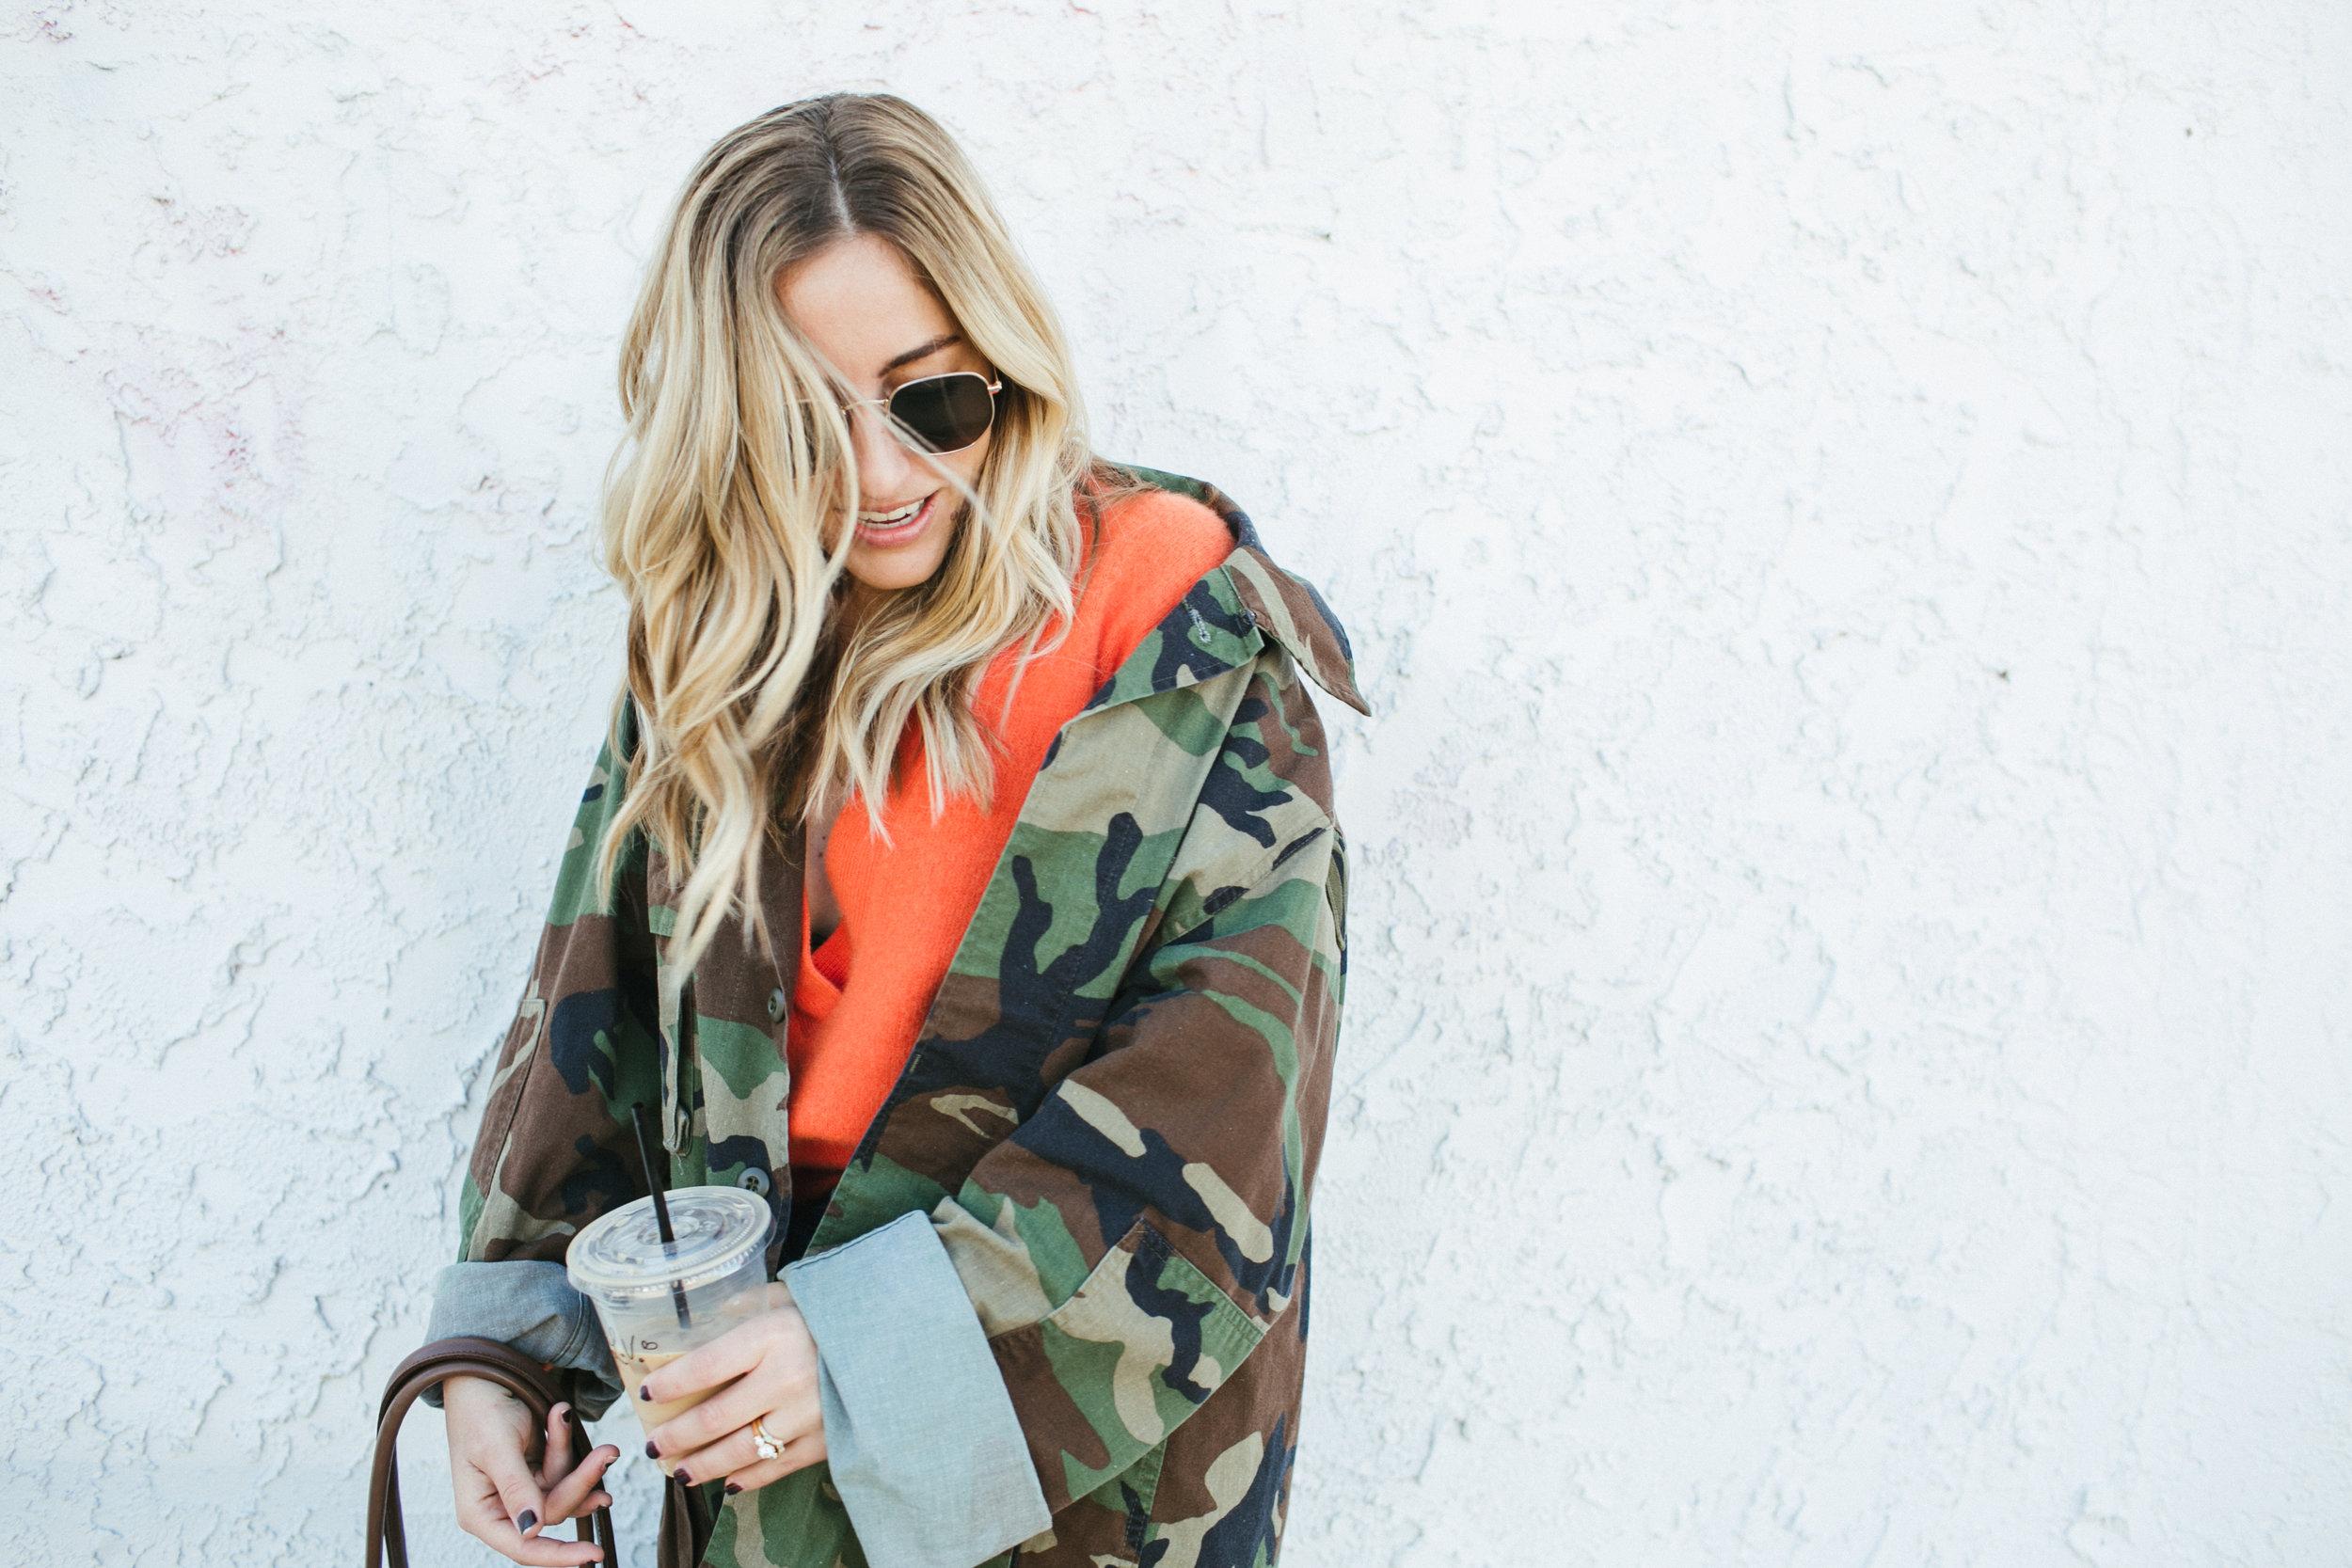 Paige-Newton-Lifestyle-Fashion-Blogger-Influencer-Photography-037.jpg